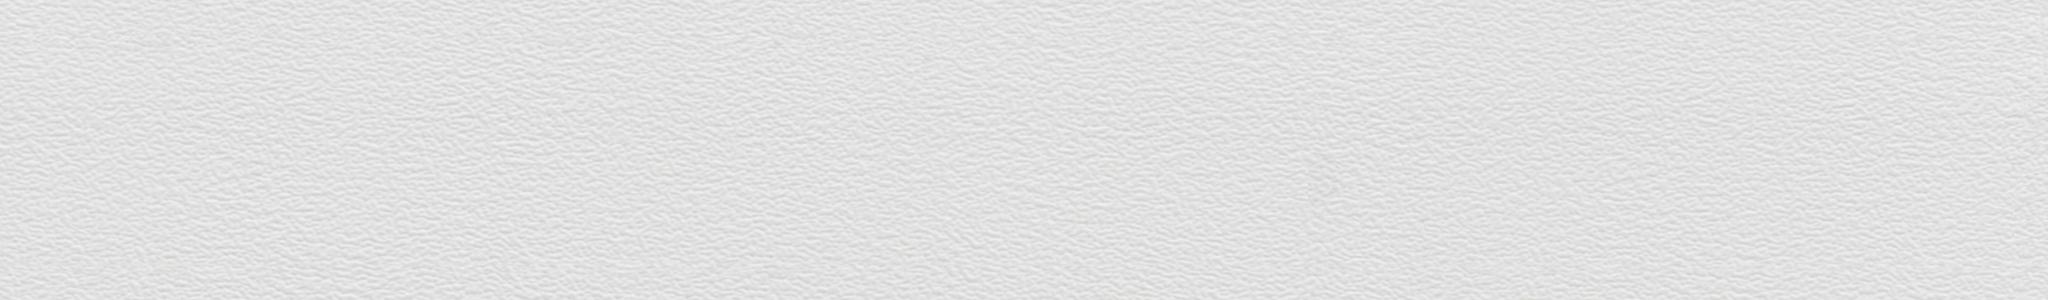 HU 172190 Кромка ABS Серая Фланель - Шагрень 101